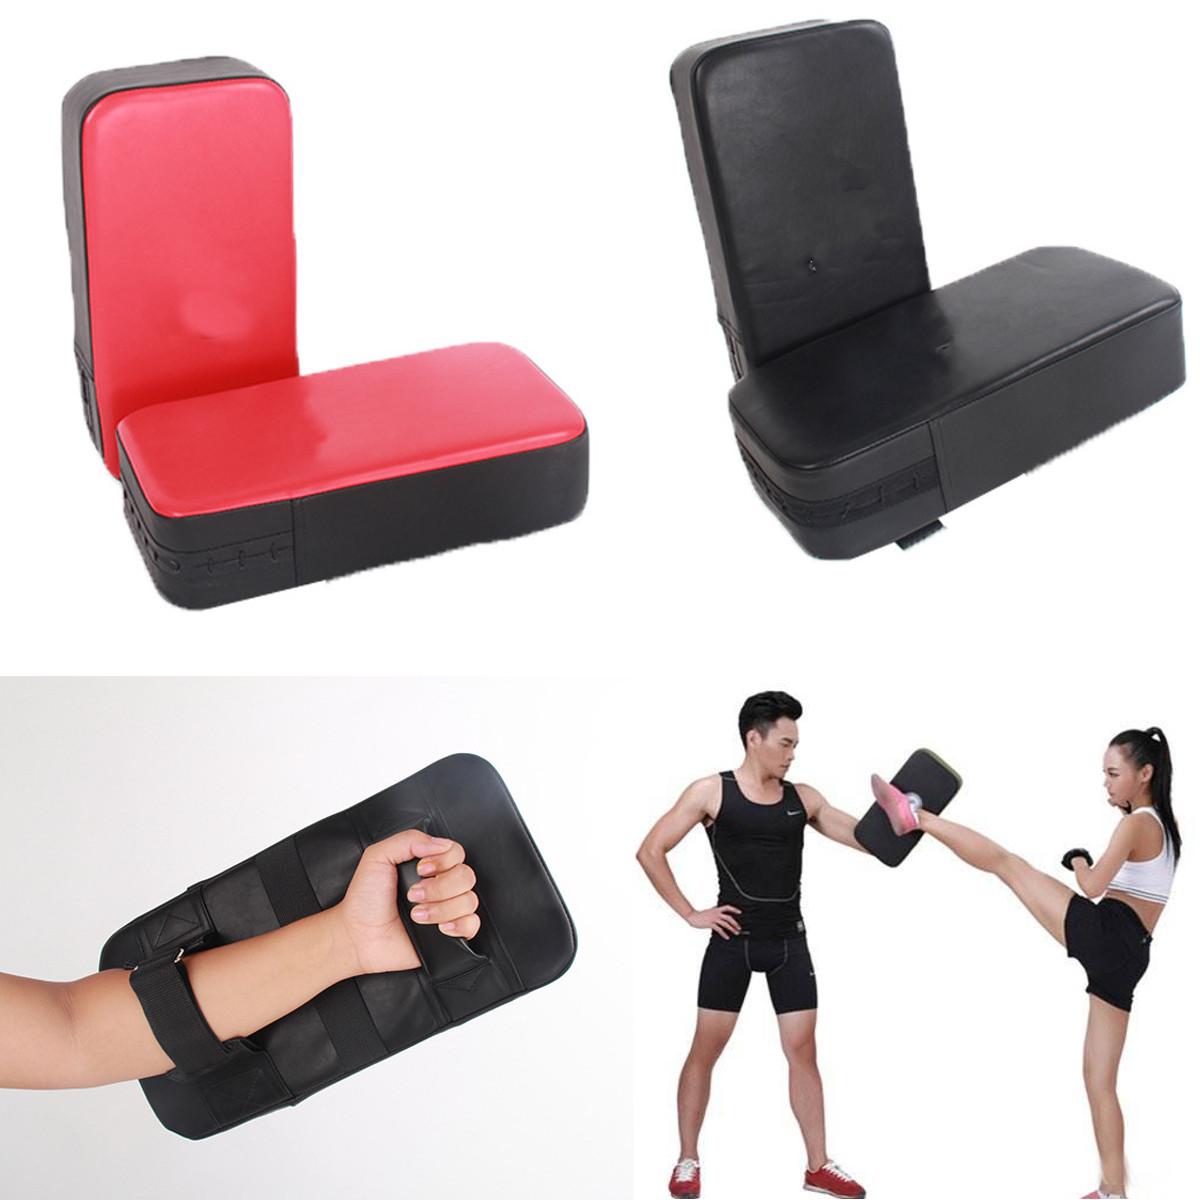 Taekwondo Focus Karate Boxing Kick Hand Target Punch Pads PU Leather Muay Thai